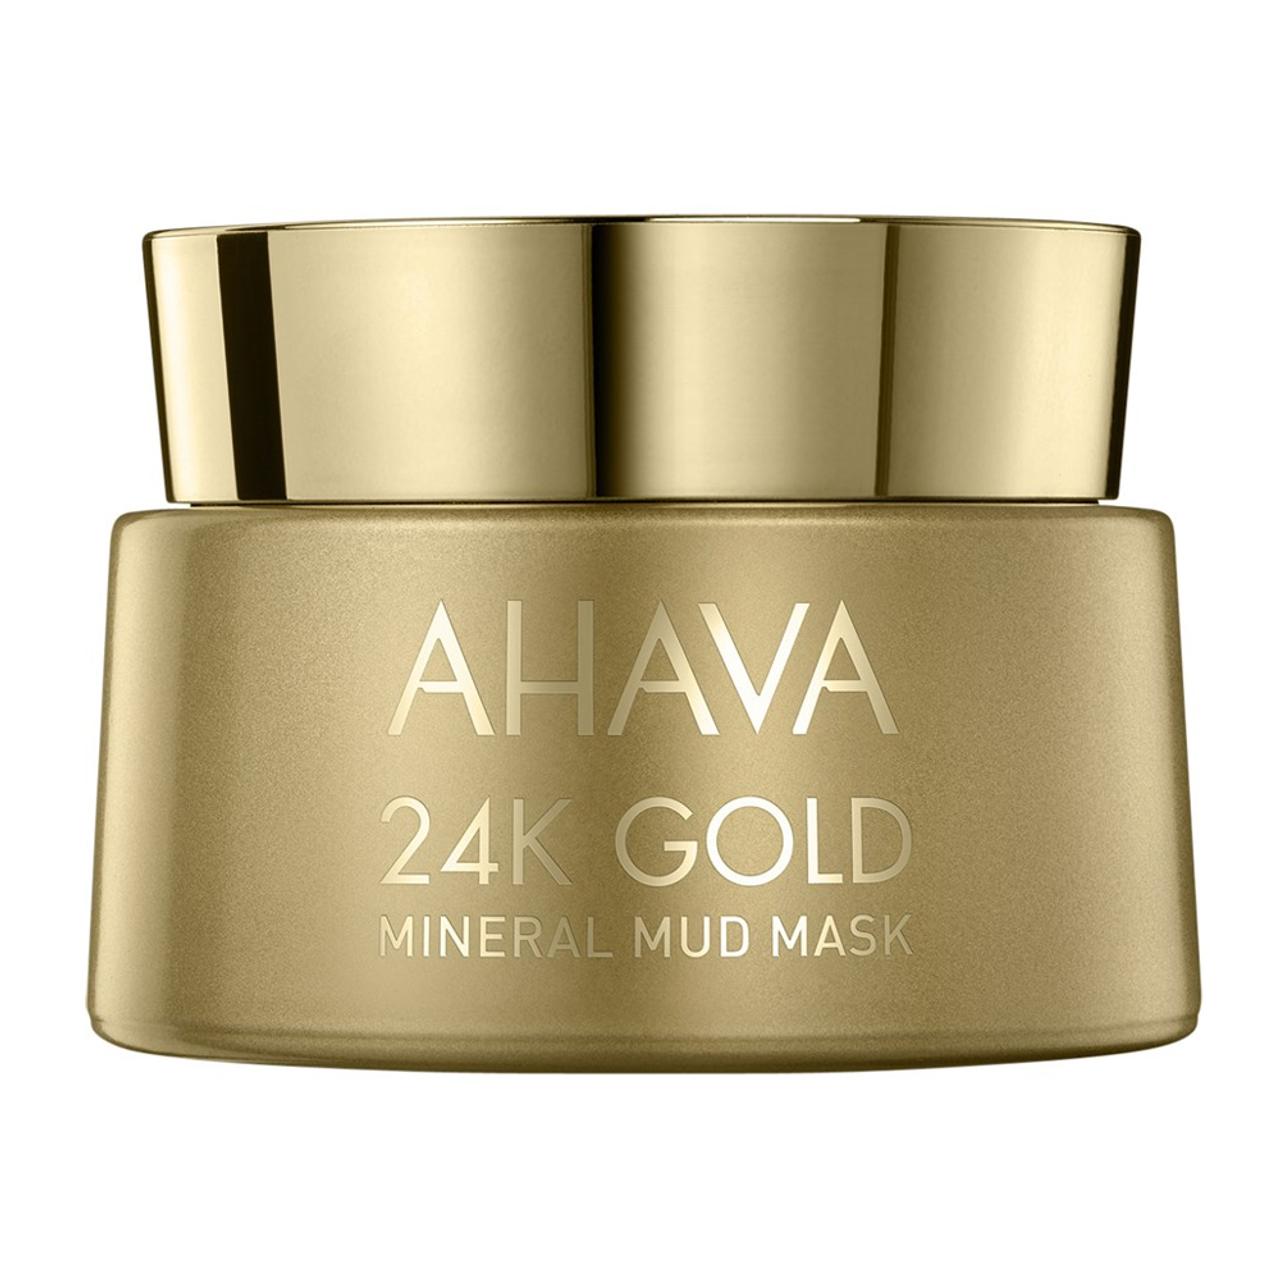 AHAVA 24K Gold Mineral Mud Mask